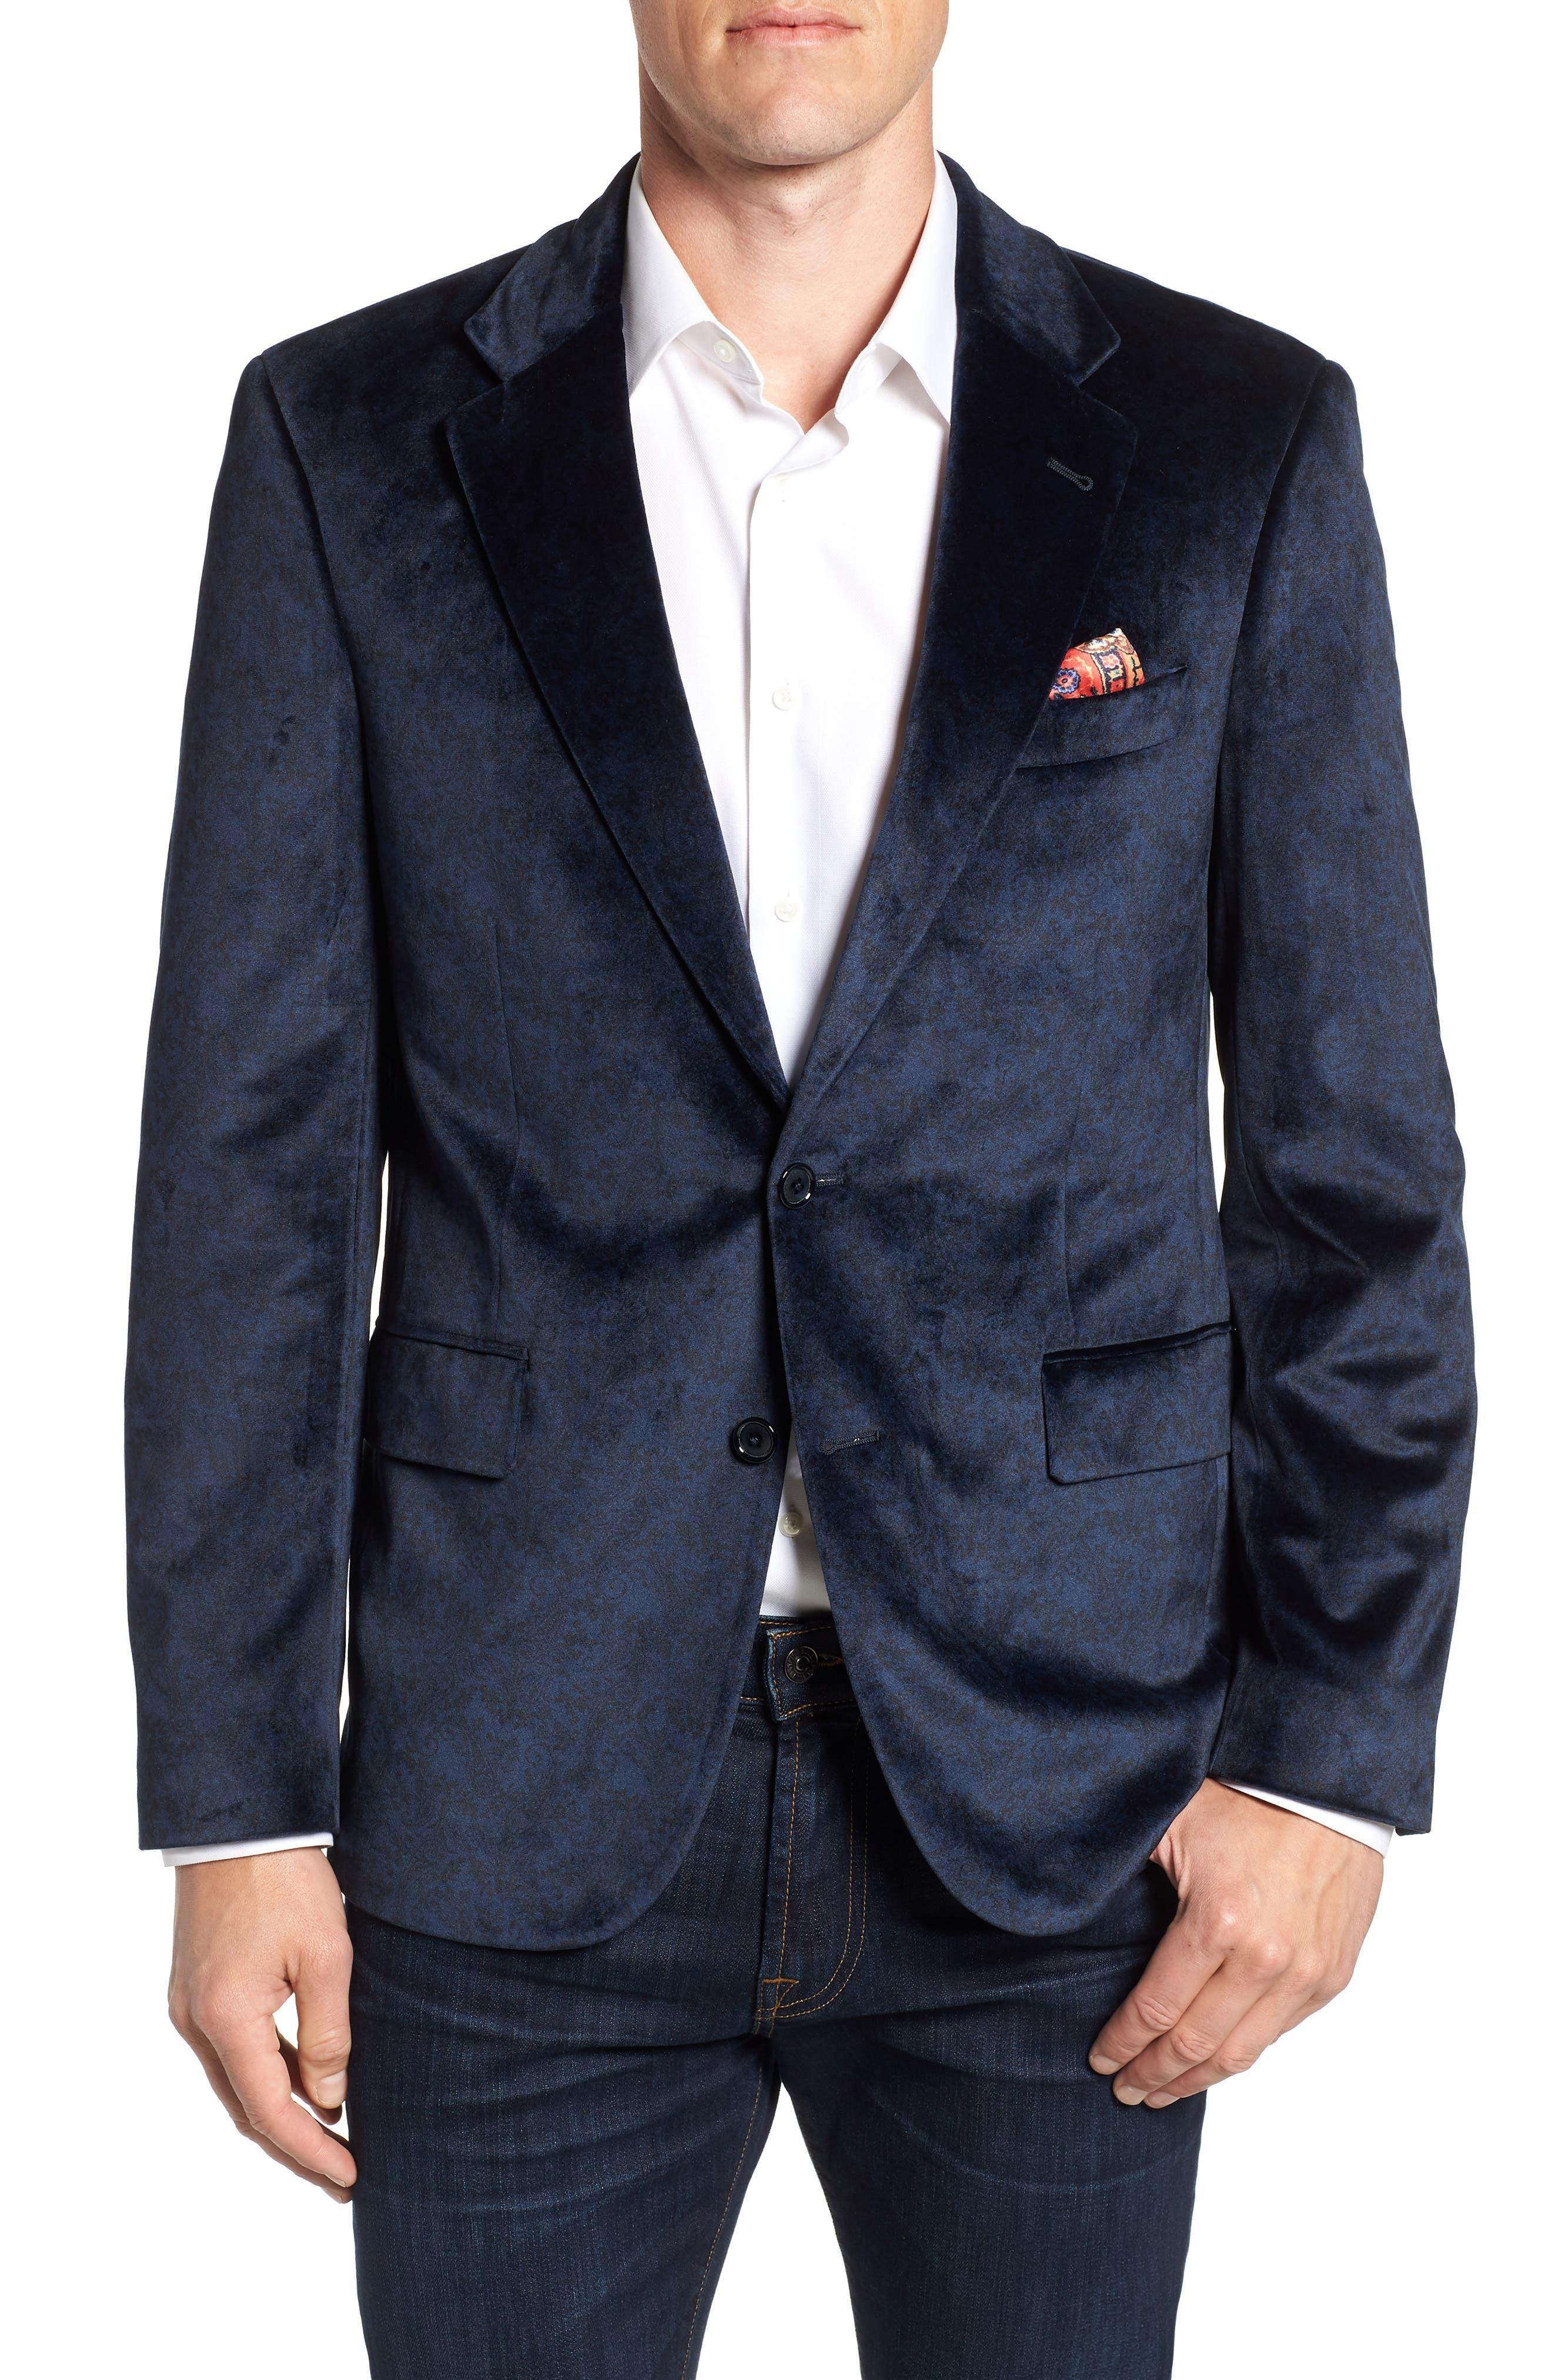 Barton Tailored Fit Blazer,                             Main thumbnail 1, color,                             NAVY